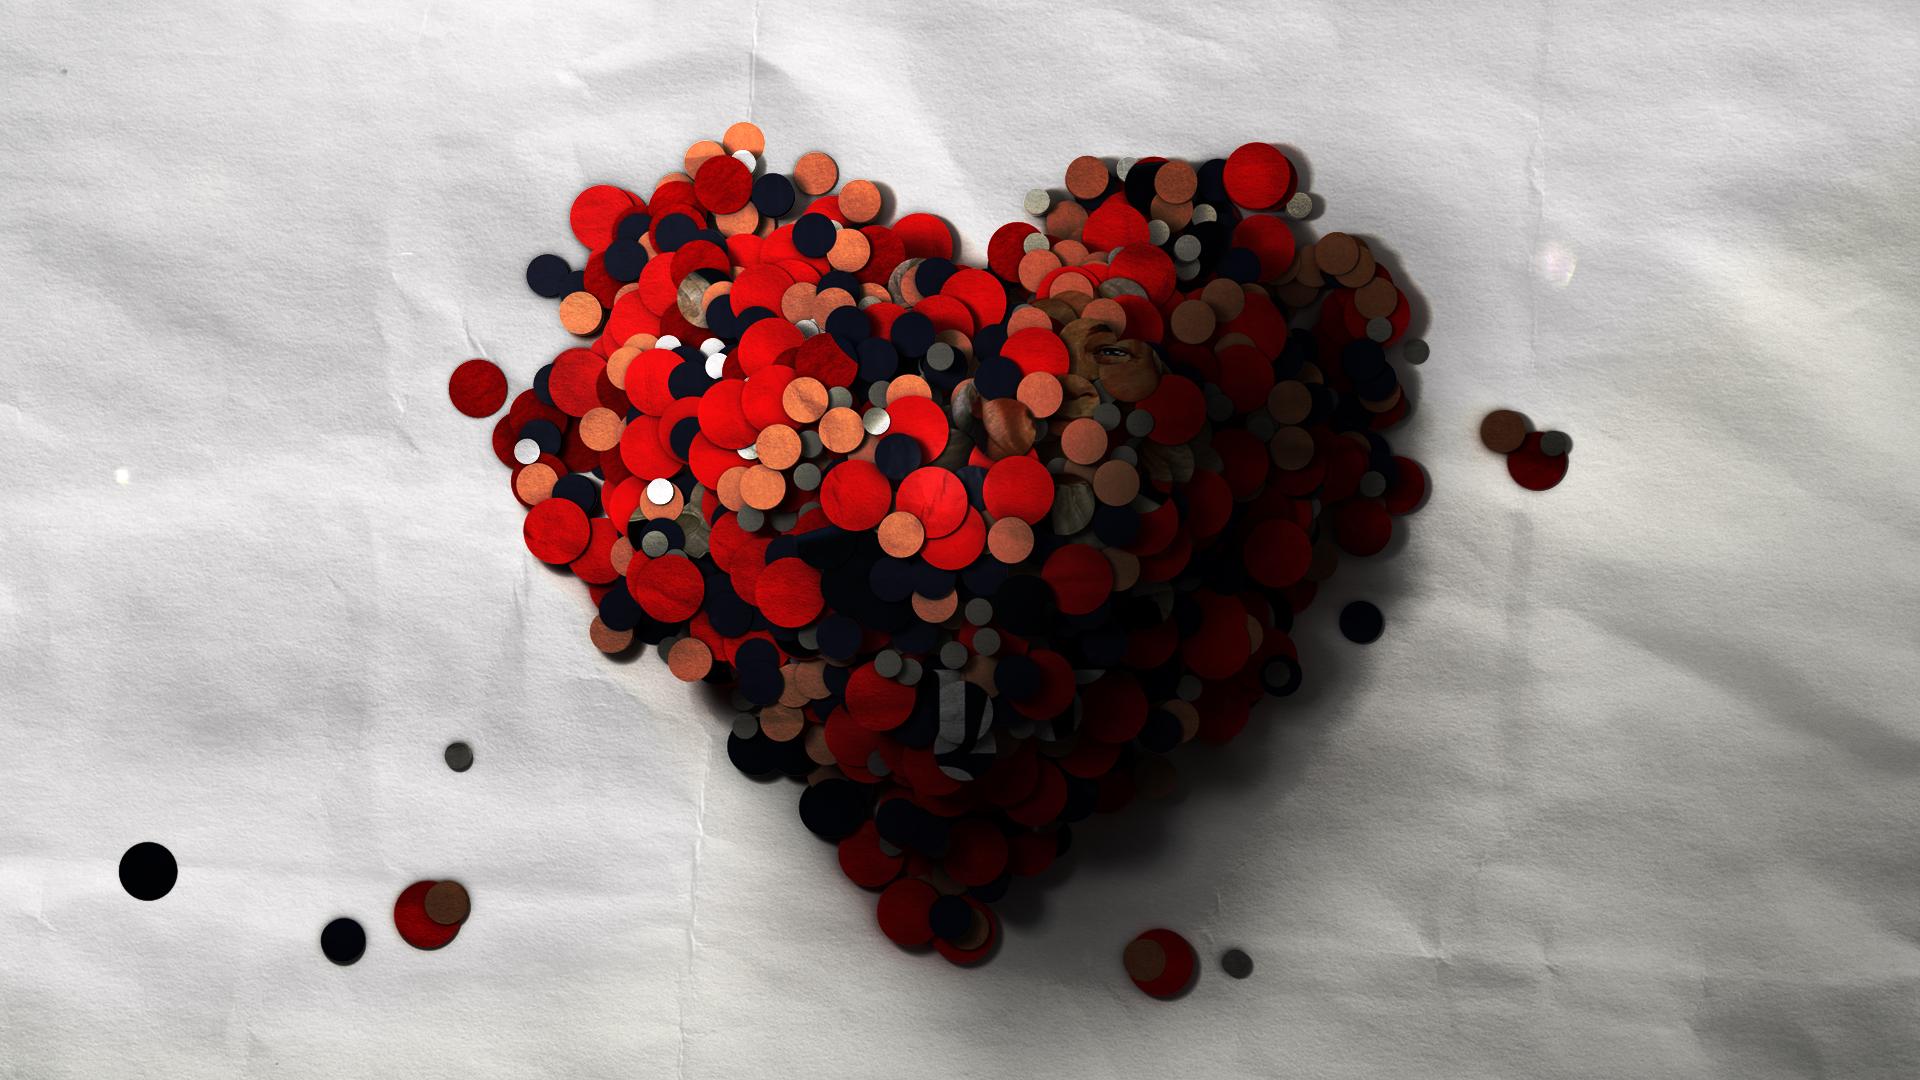 Quaker_HEART_A031_v002_0034.jpg